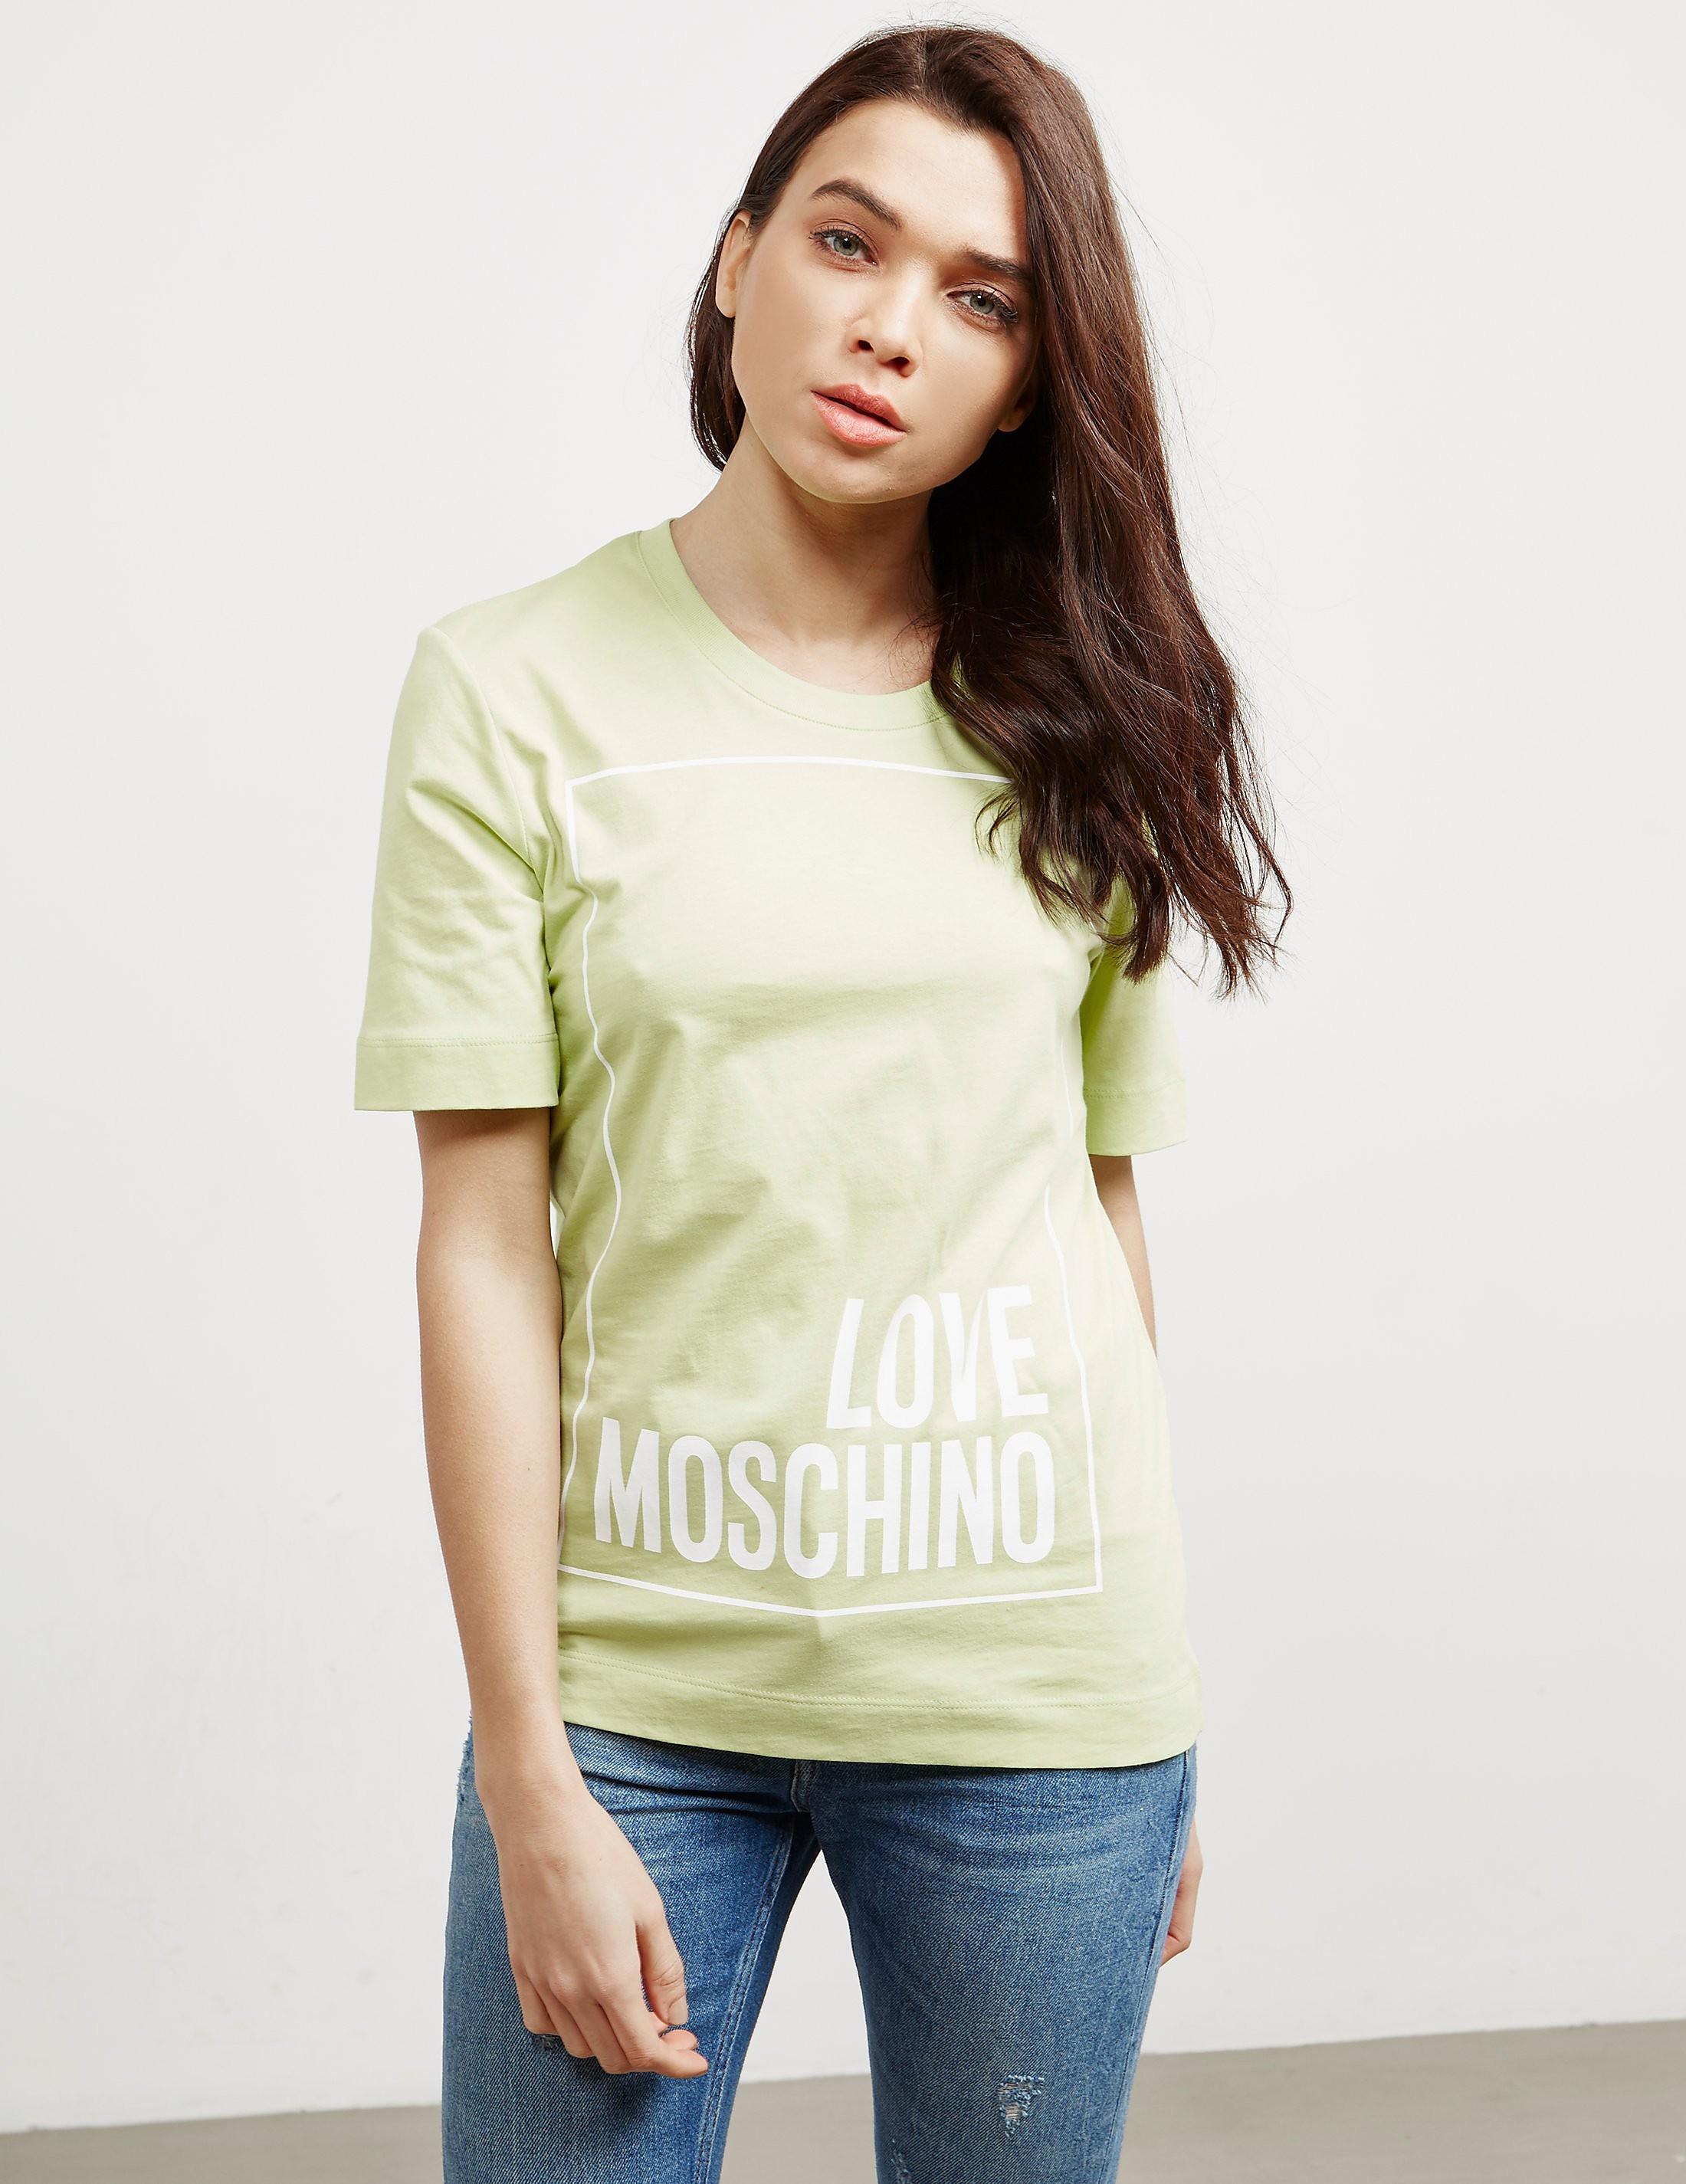 Love Moschino Square Short Sleeve T-Shirt